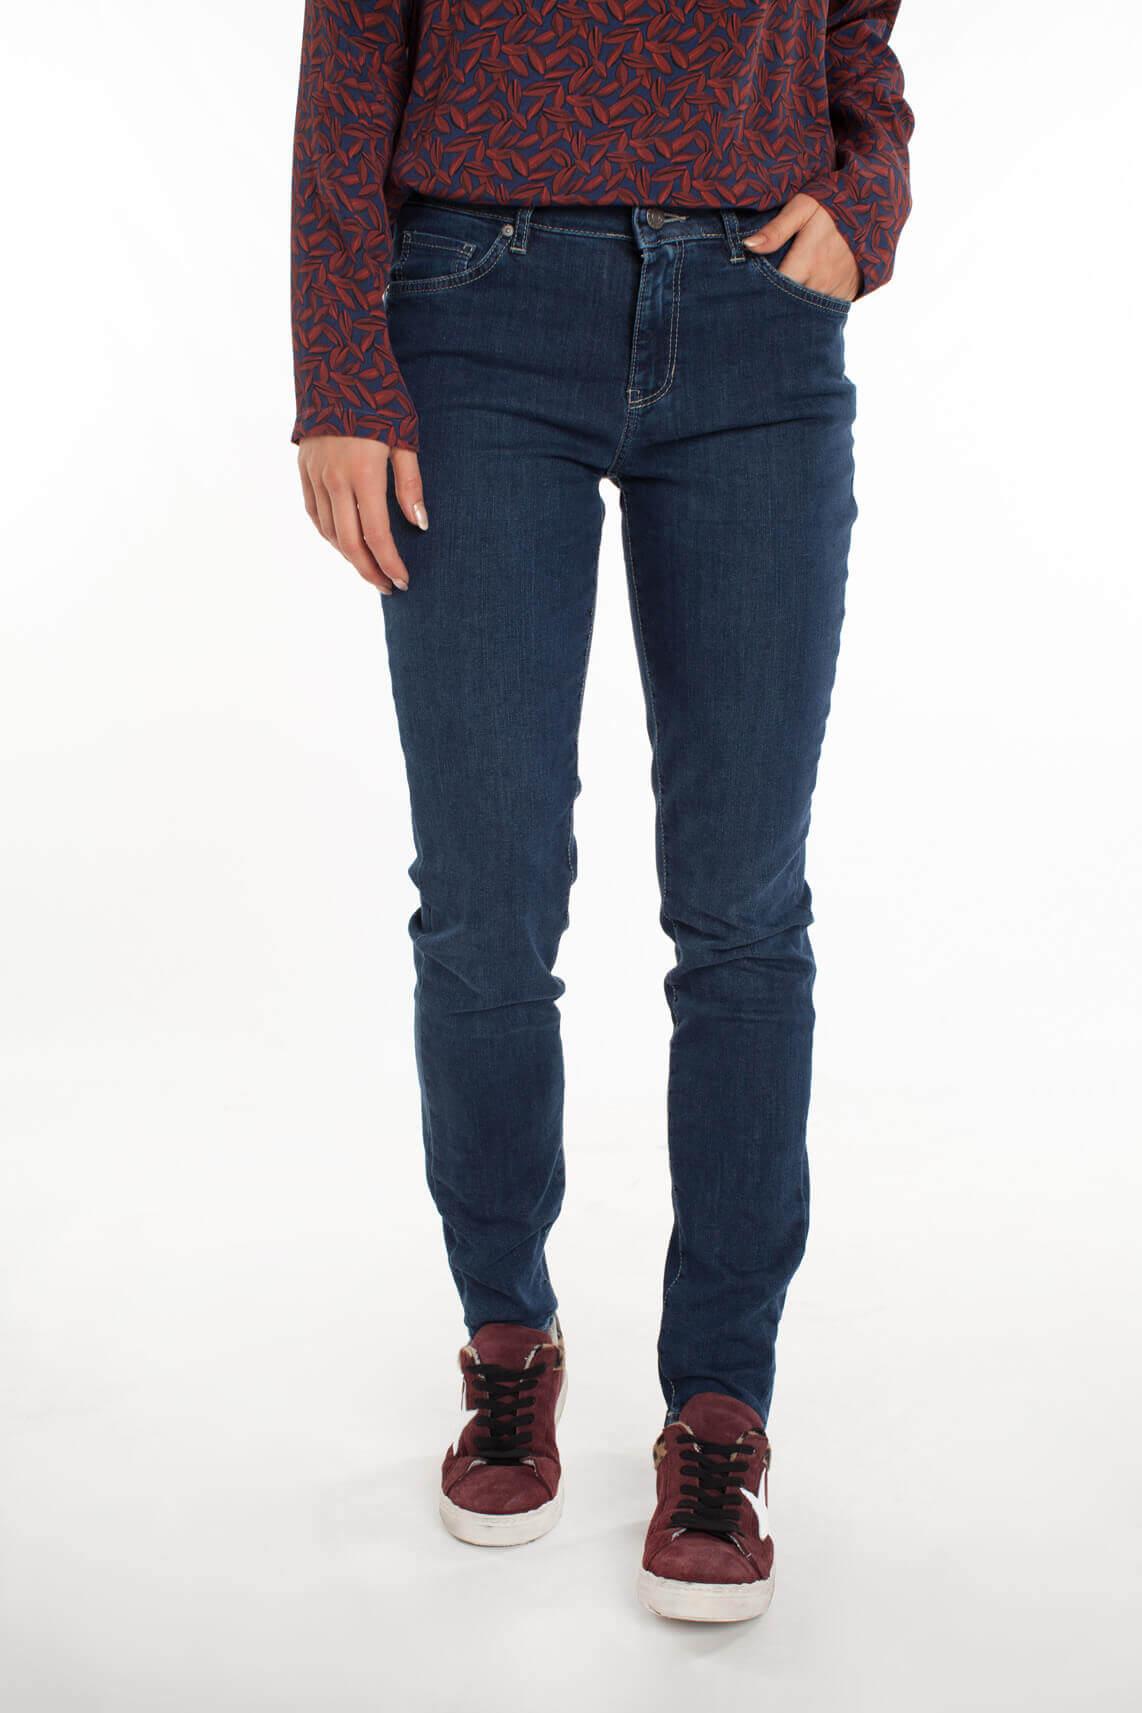 Rosner Dames Antonia jeans 0